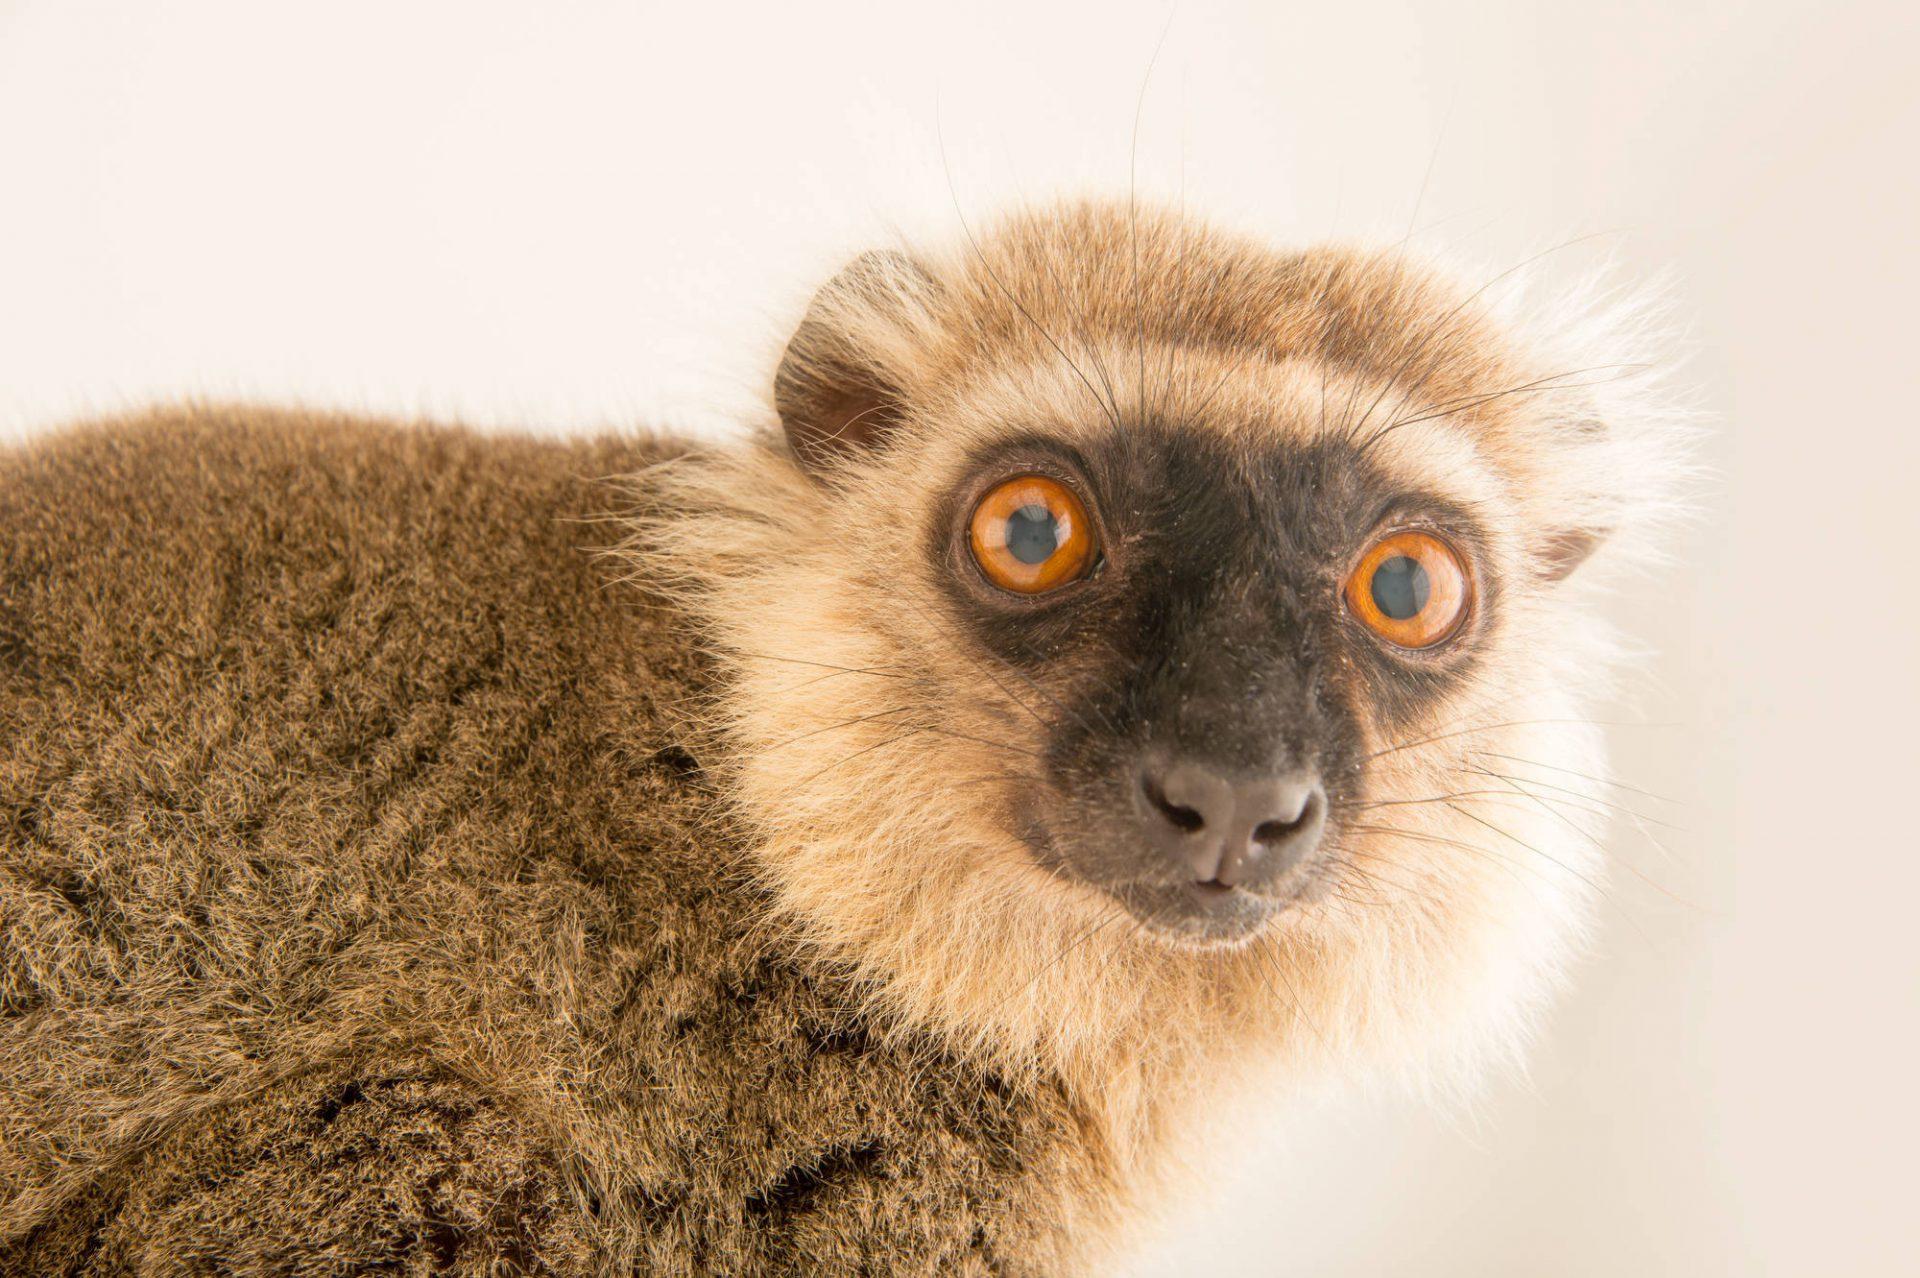 Picture of Ikoto, the last captive, endangered, male Sanford's lemur (Eulemur sanfordi) at the Lemur Conservation Foundation near Myakka City, Florida.